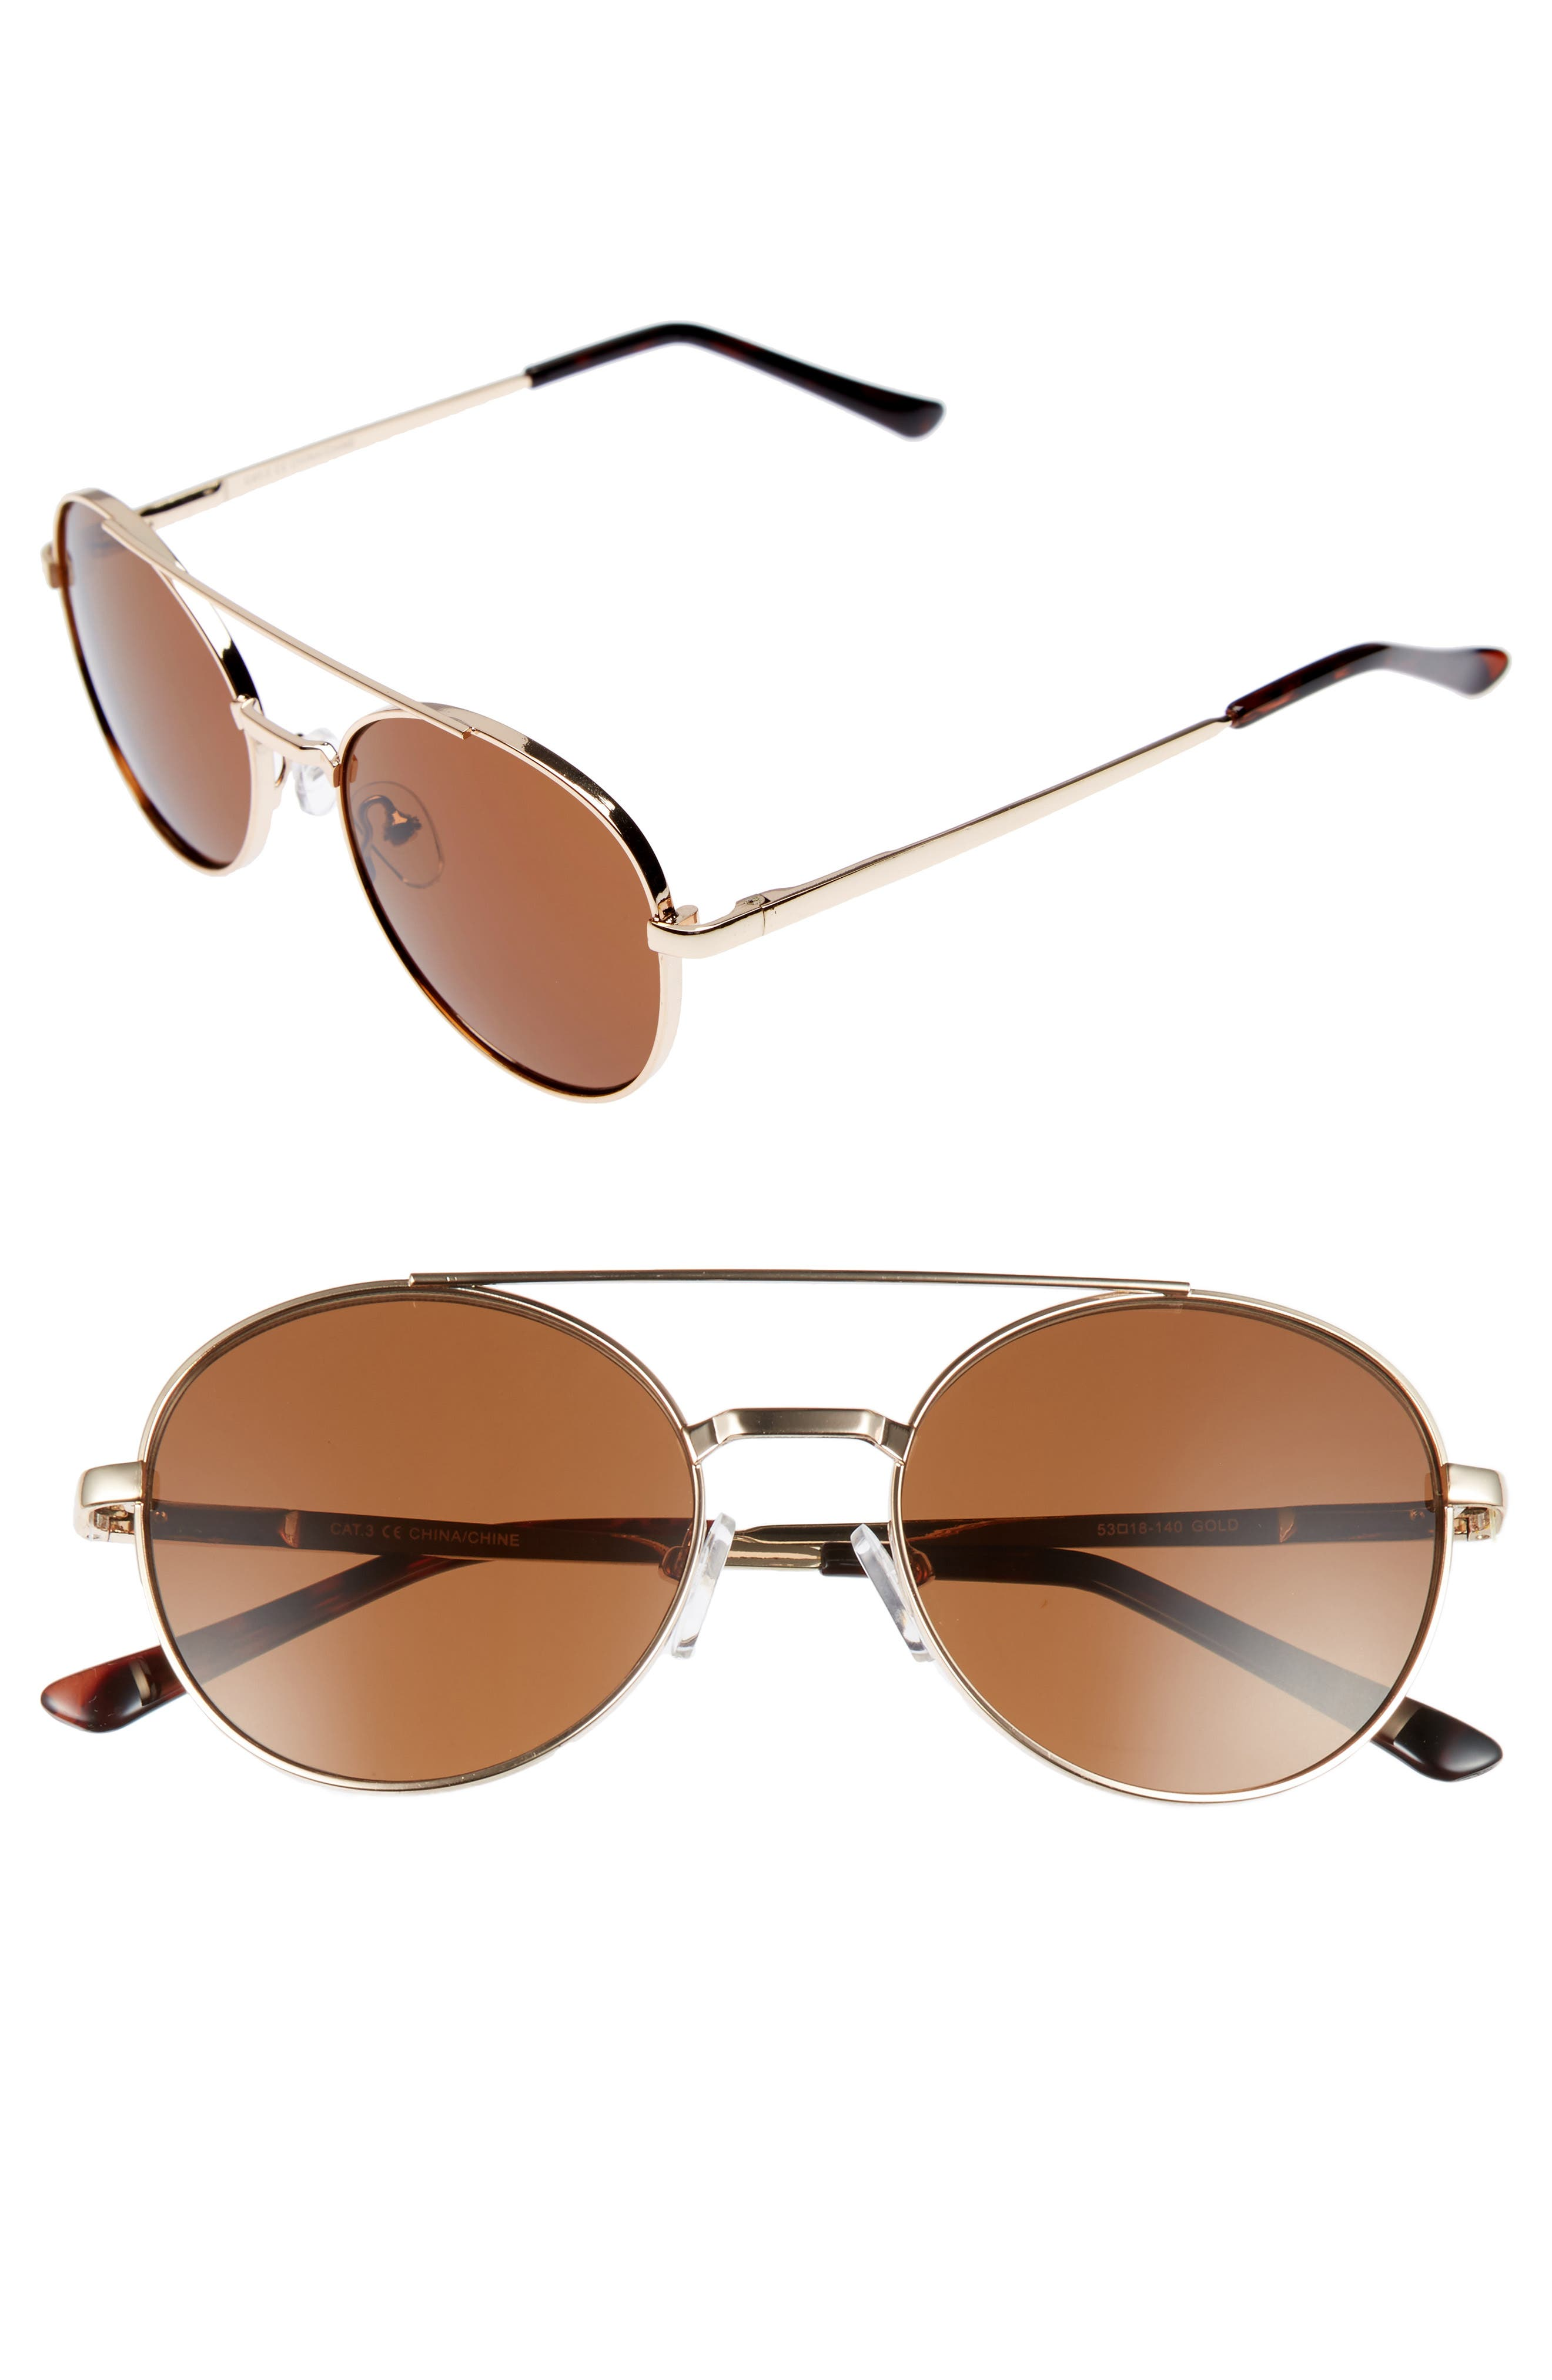 Logan 52mm Sunglasses,                         Main,                         color, Gold/ Brown